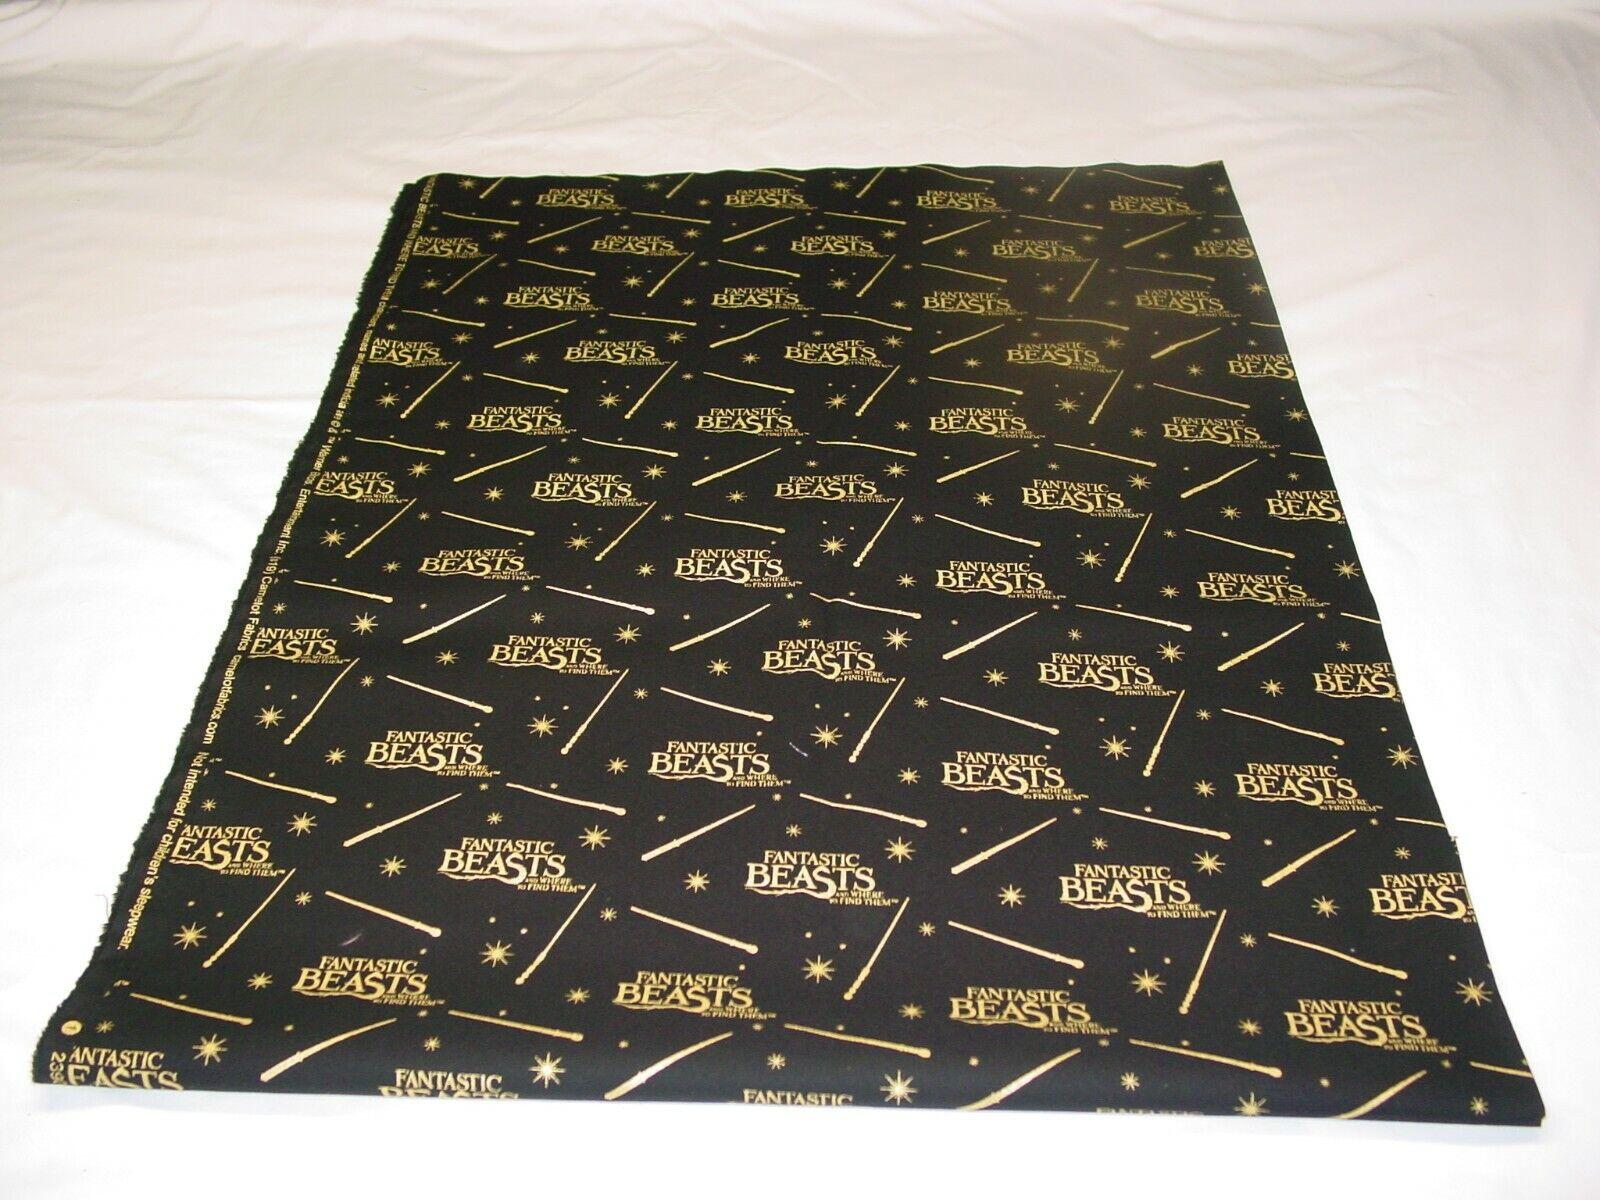 FANTASTIC BEAST GOLD BLACK 100 COTTON FABRIC REMNANT LENGTH 33 X WIDTH 42  - $10.50